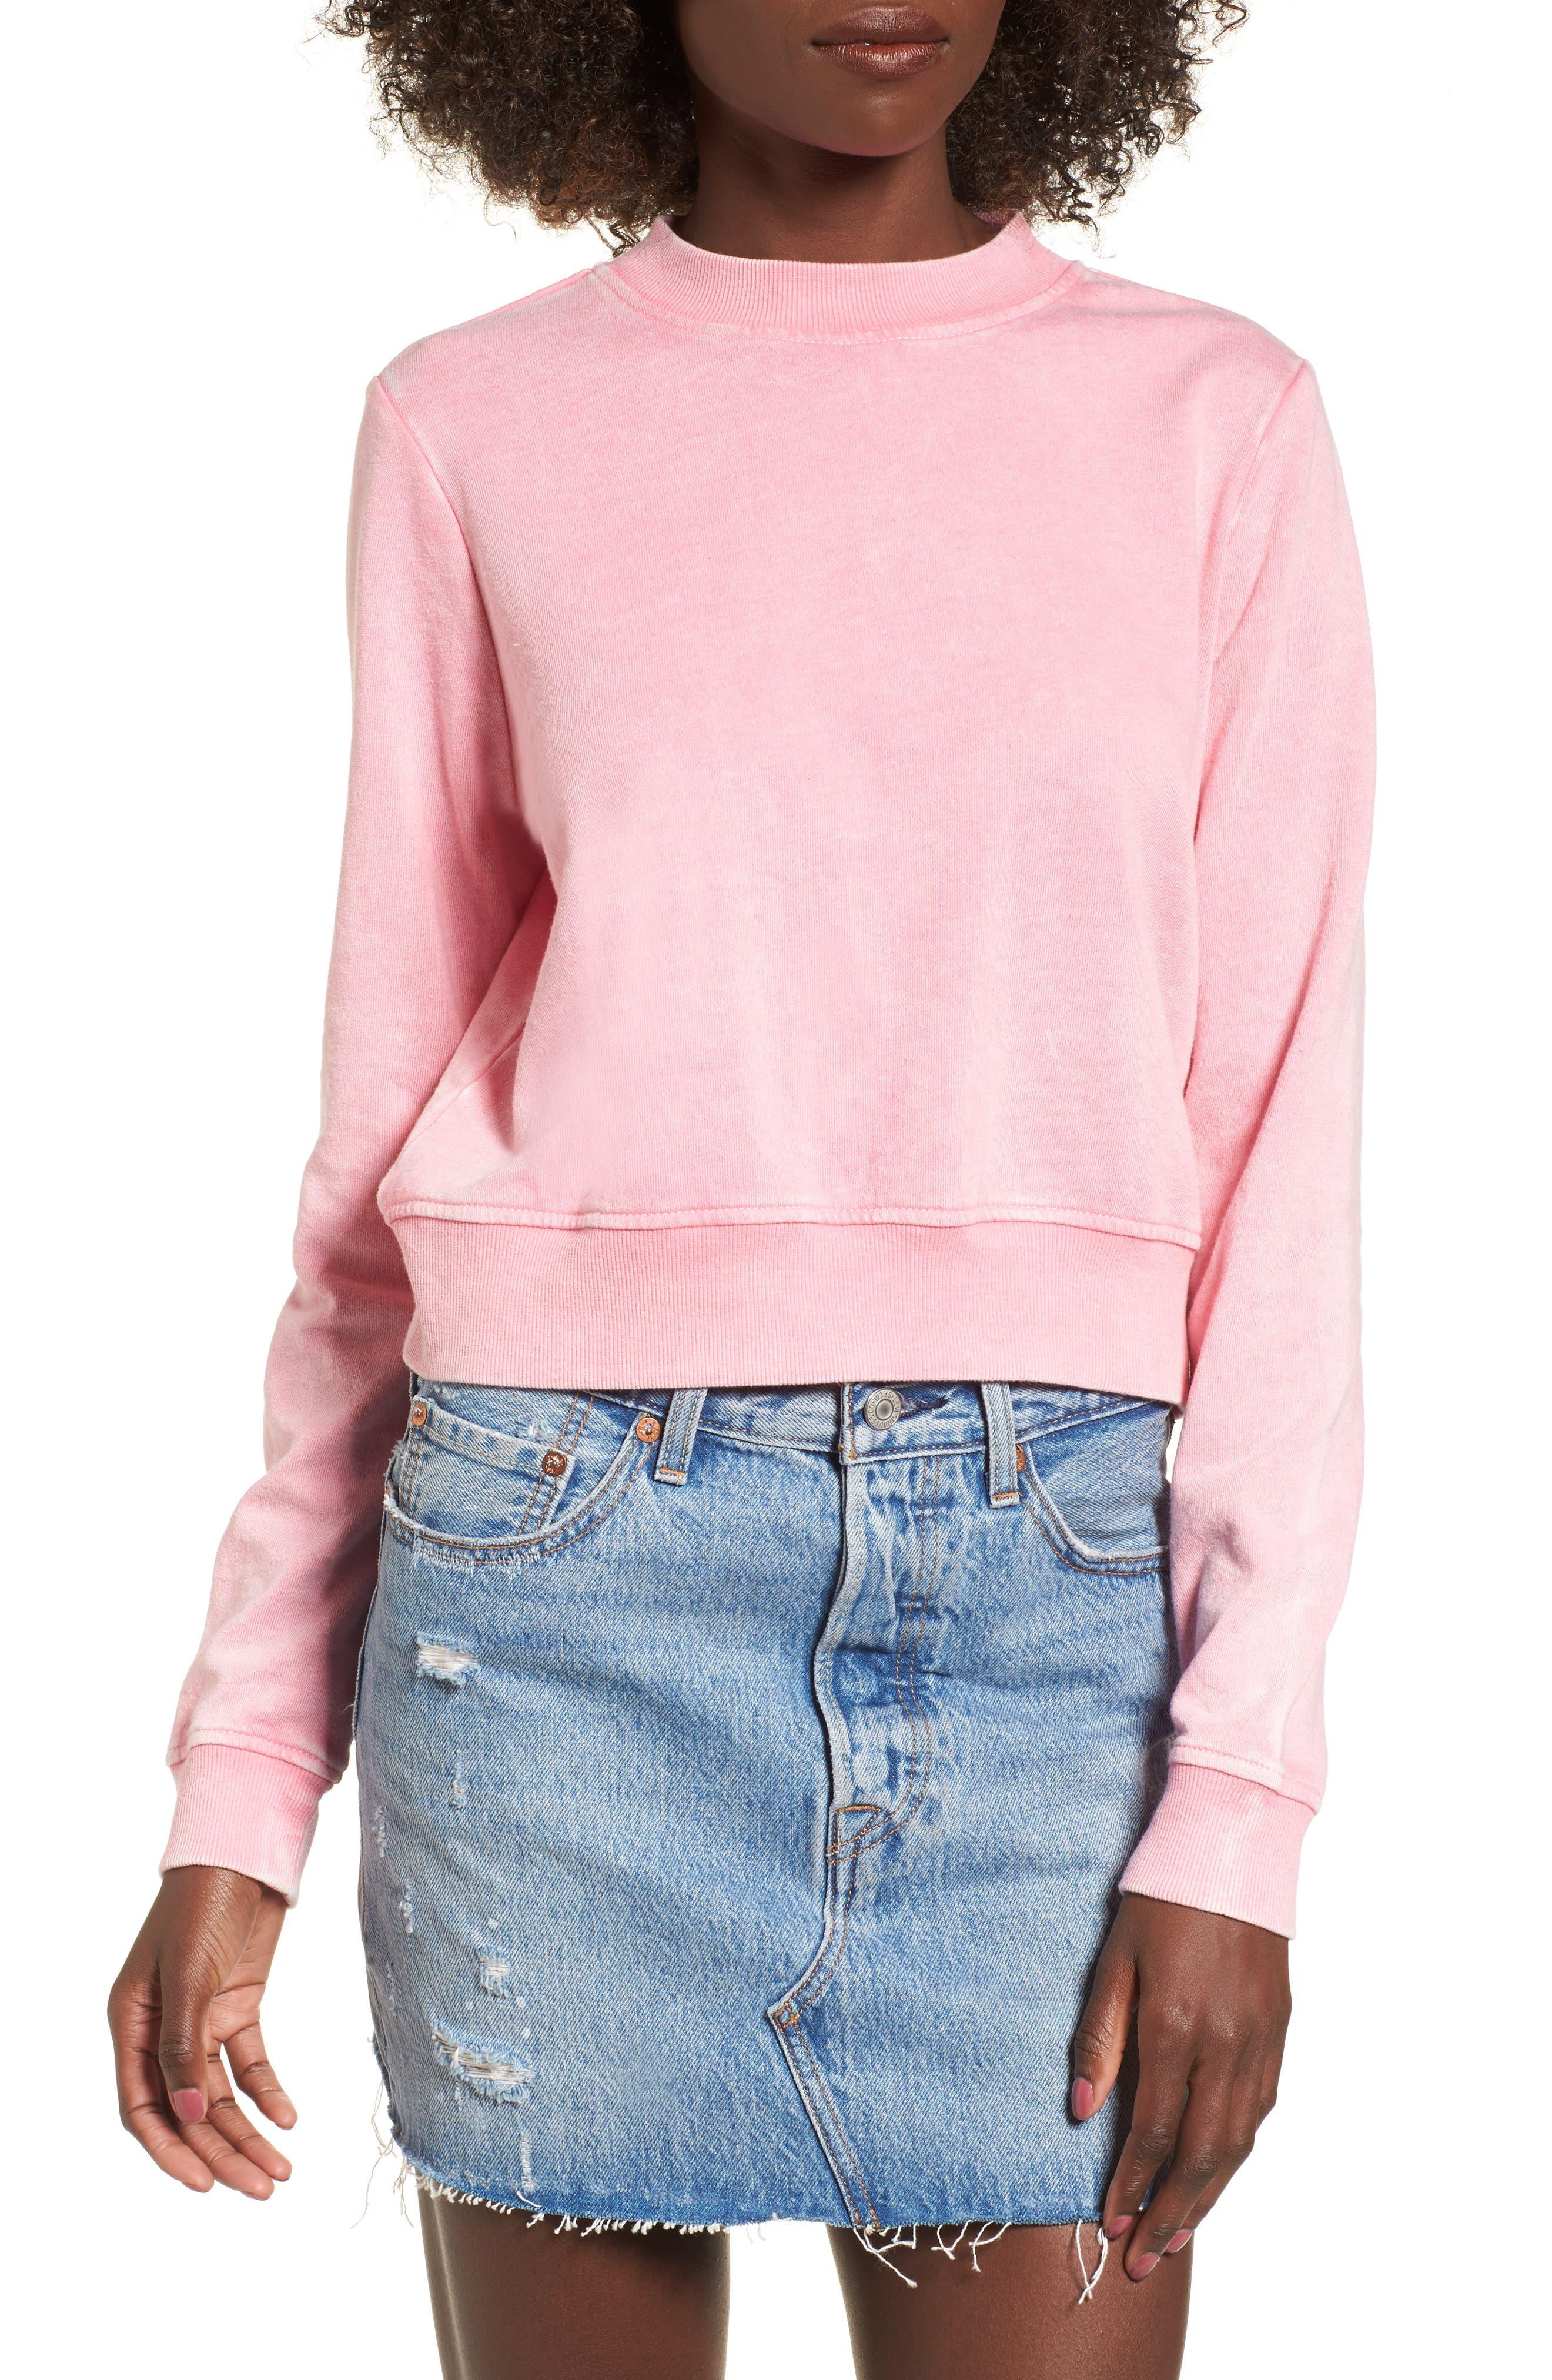 Alternate Image 1 Selected - Love, Fire Washed Crop Sweatshirt